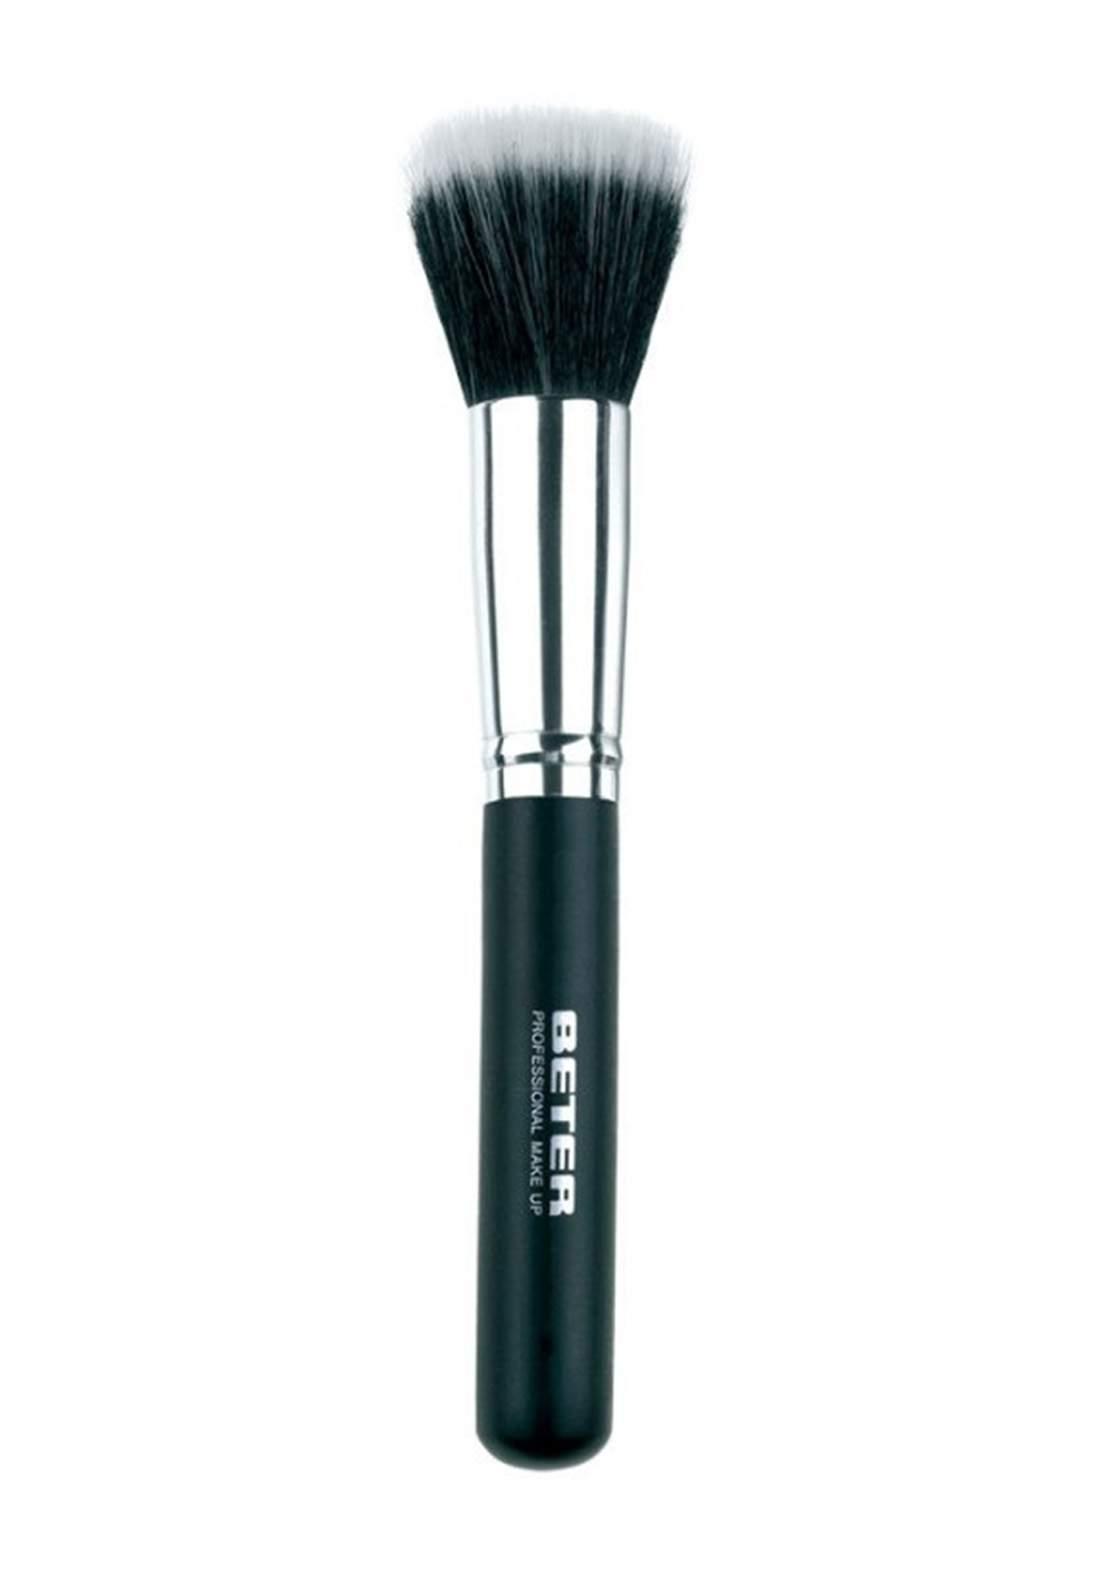 Beter Kabuki Brush Synthetic Hair 17cm فرشاة كريم أساس